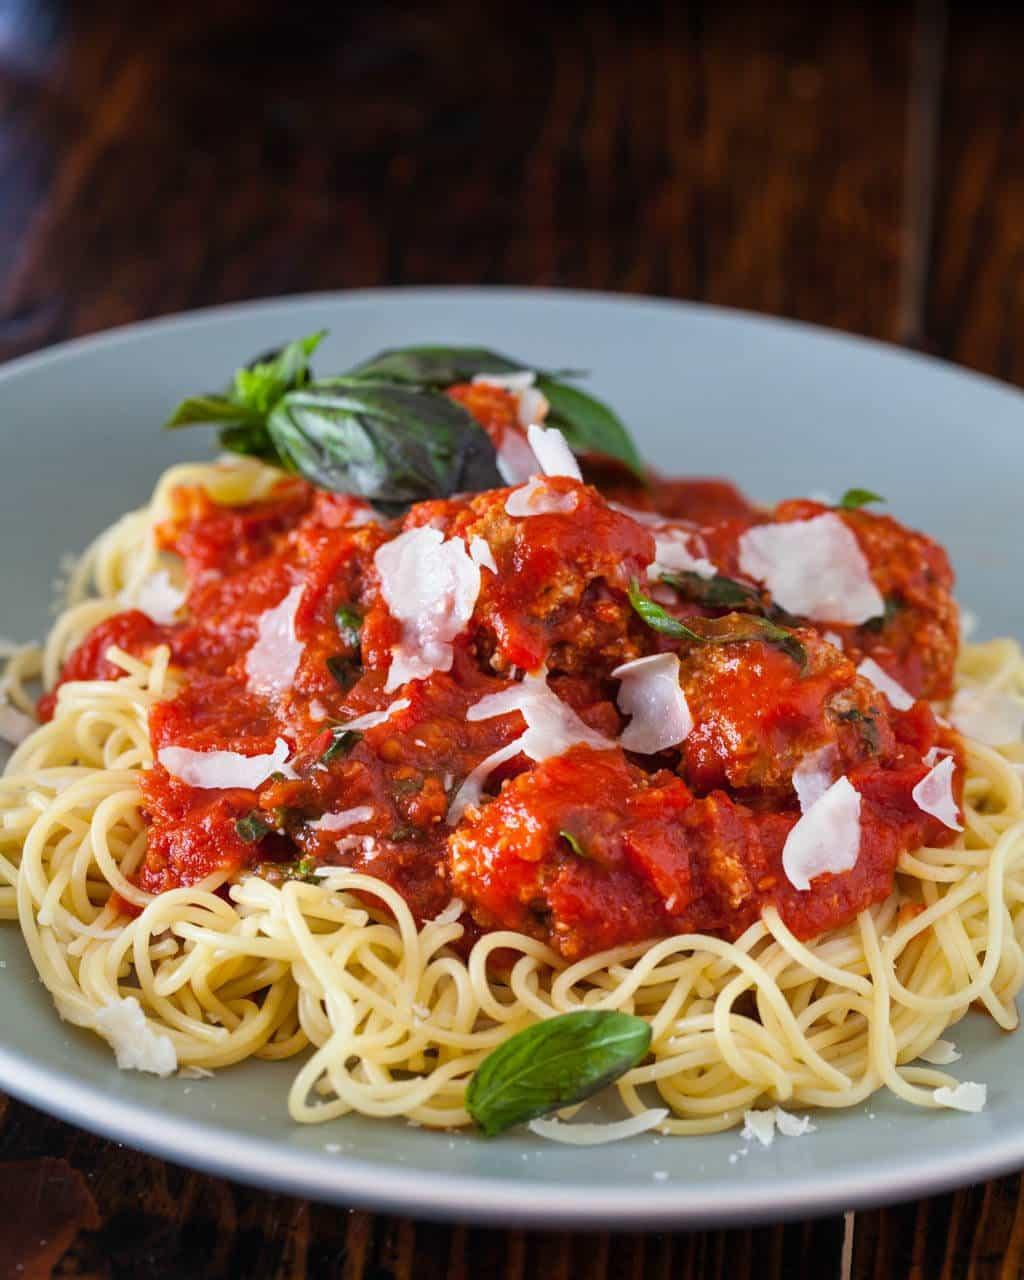 Is Spaghetti Healthy  Healthy Spaghetti and Meatballs 2 Secret Ingre nts